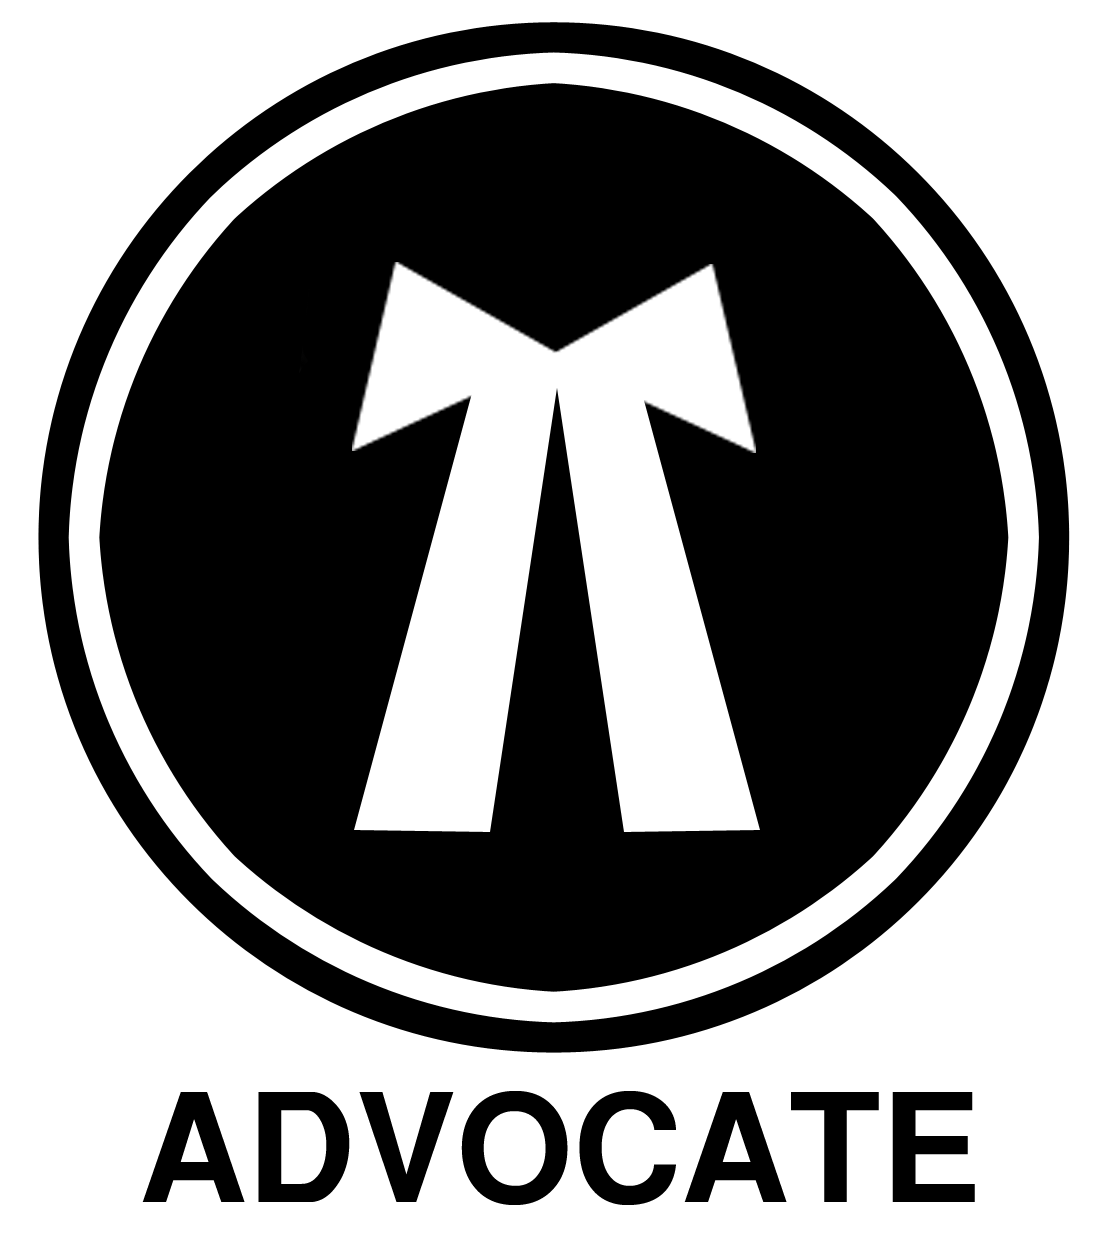 Posted by Gagan Krishnadas at 12 02 PMIndian Advocate Logo